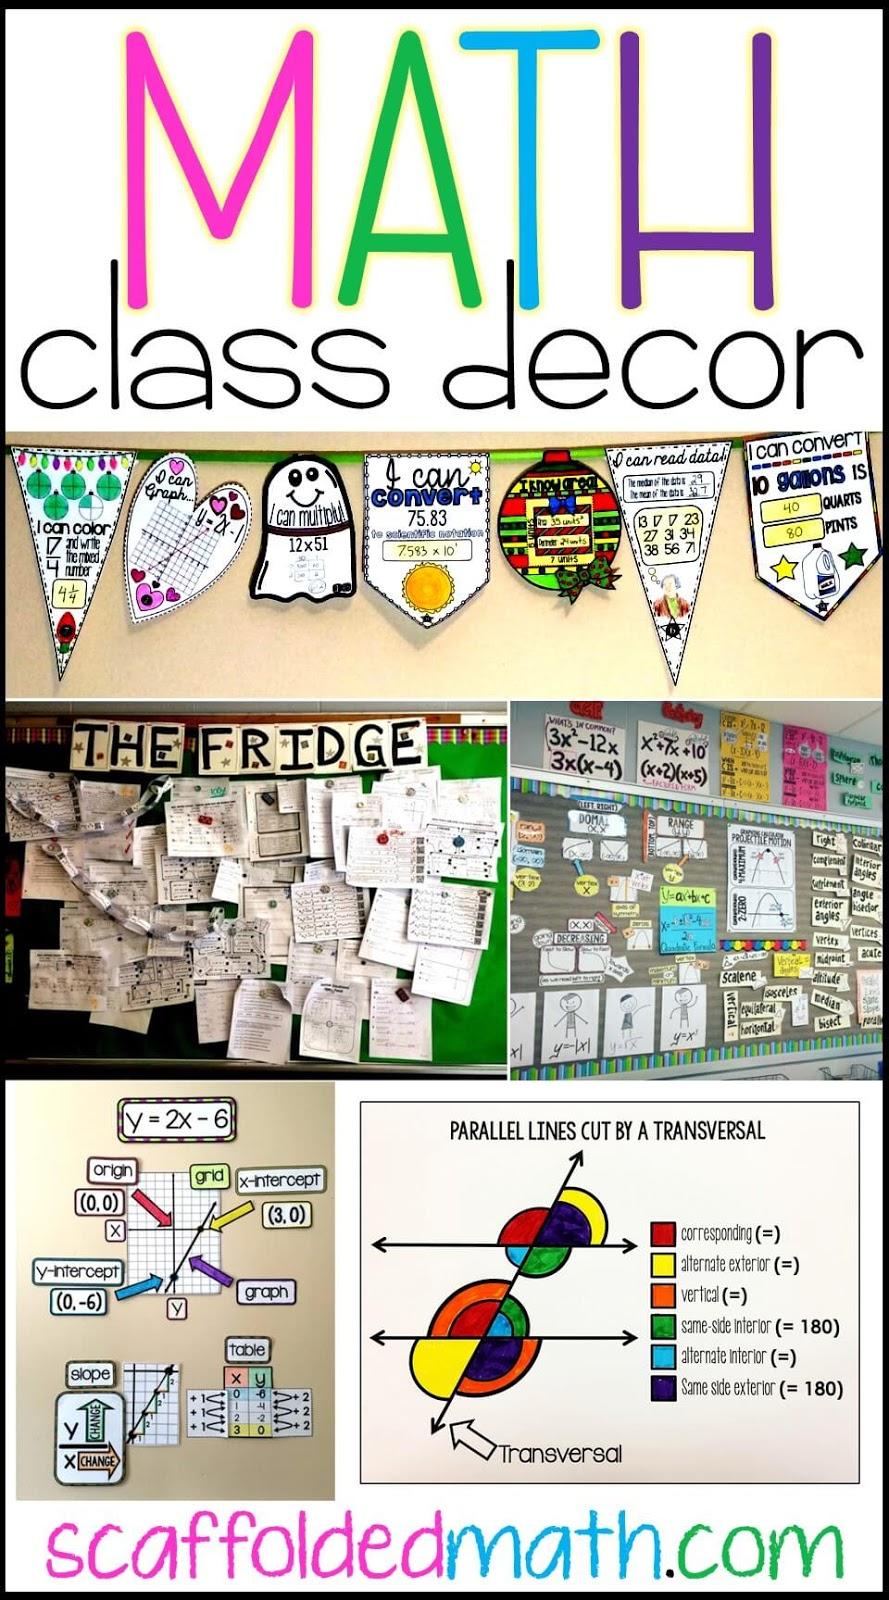 Wall Decoration Classroom Decoration Ideas For Teachers Arte Inspire